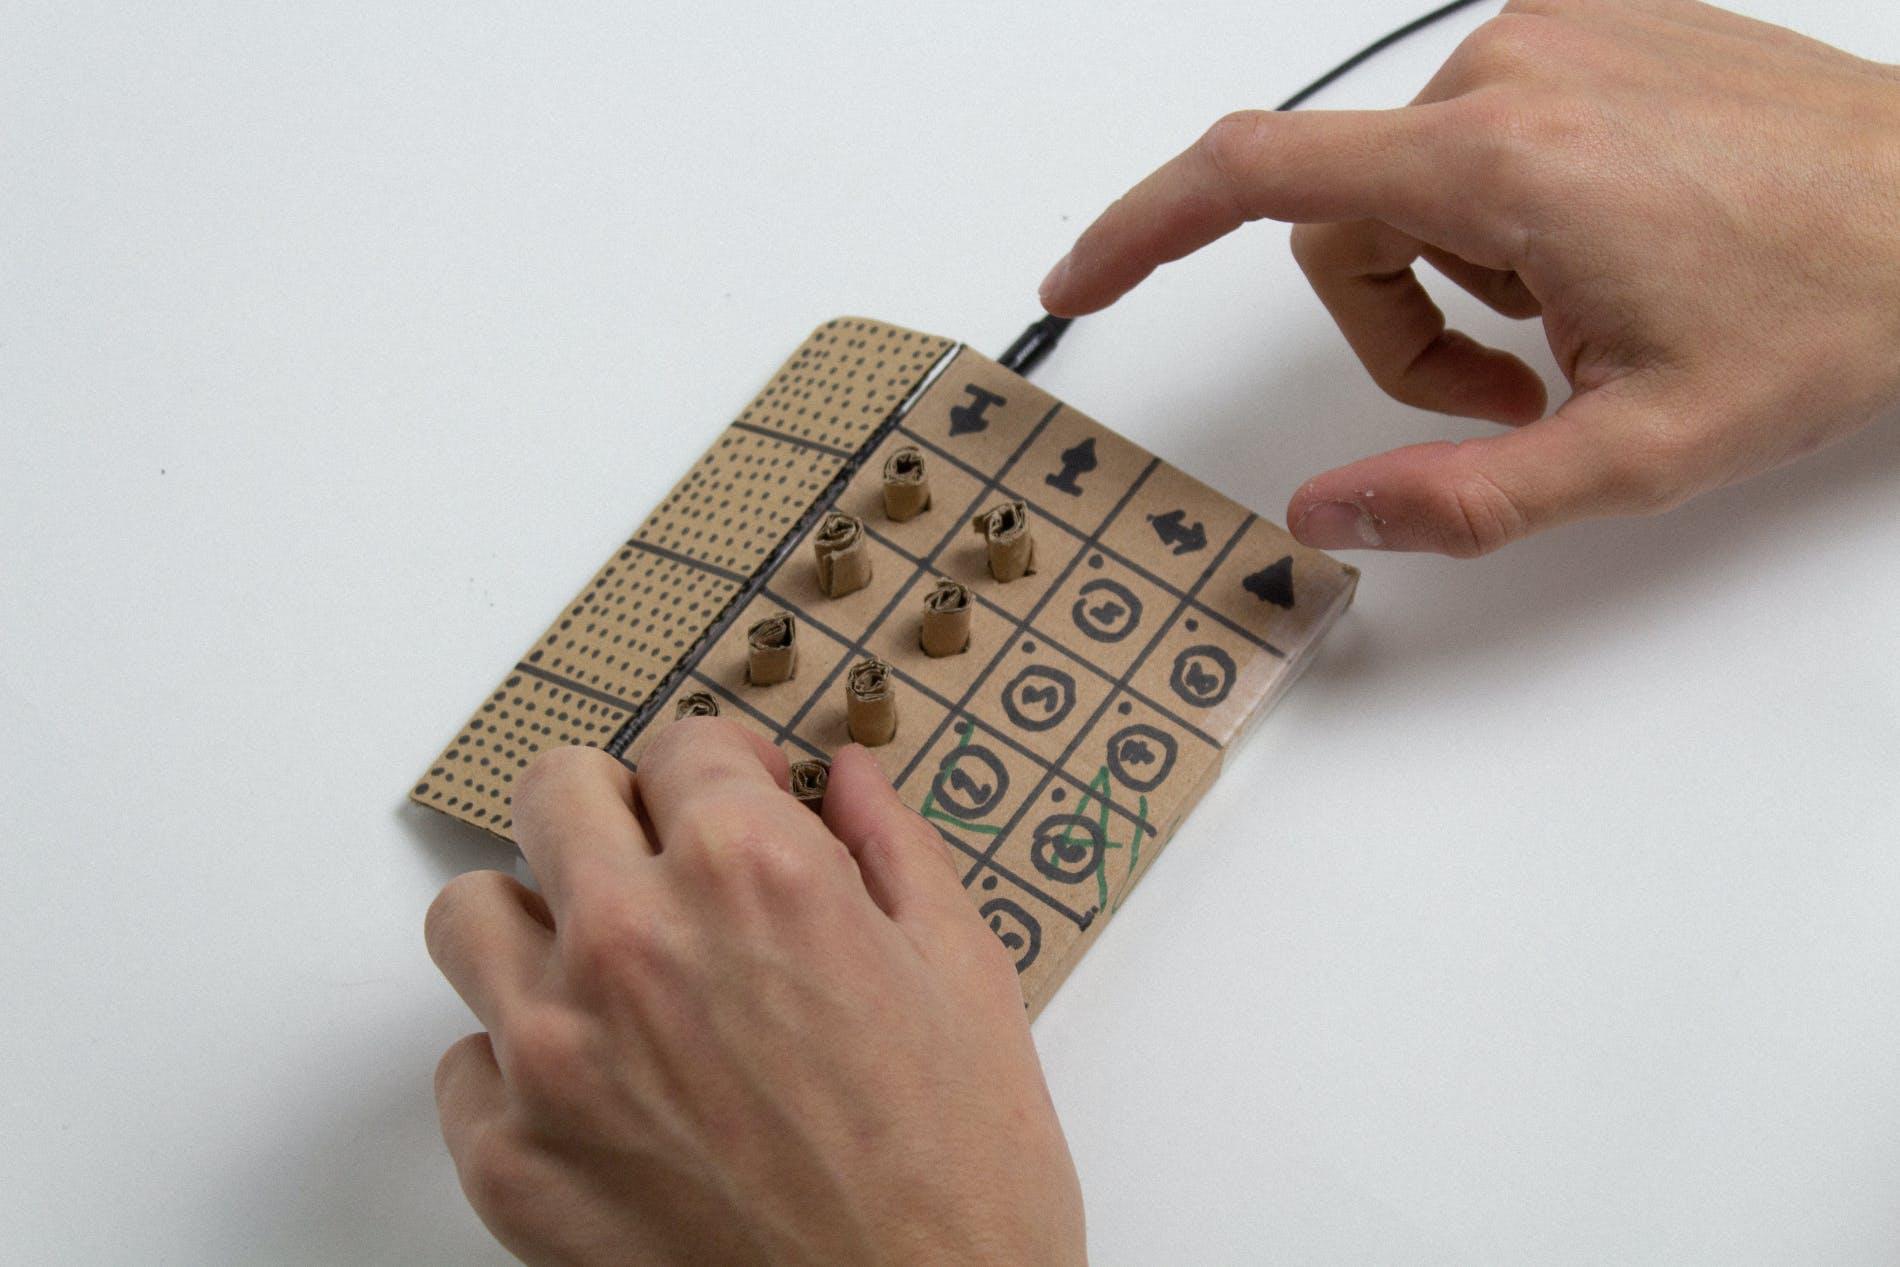 Godfried cardboard prototype